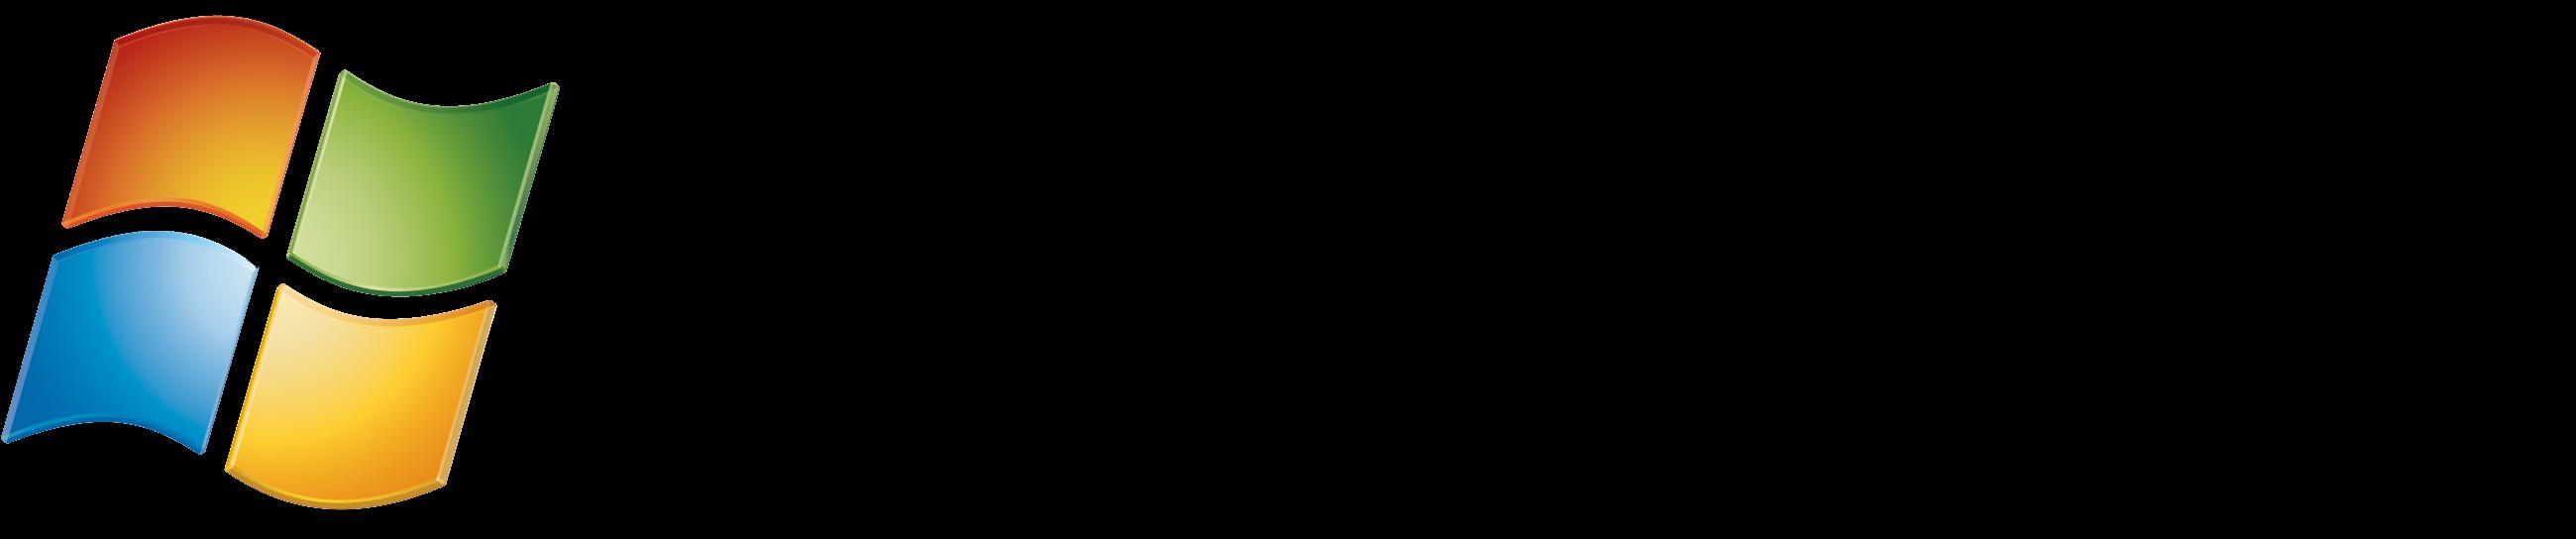 fichierwindows vistapng � wikip233dia